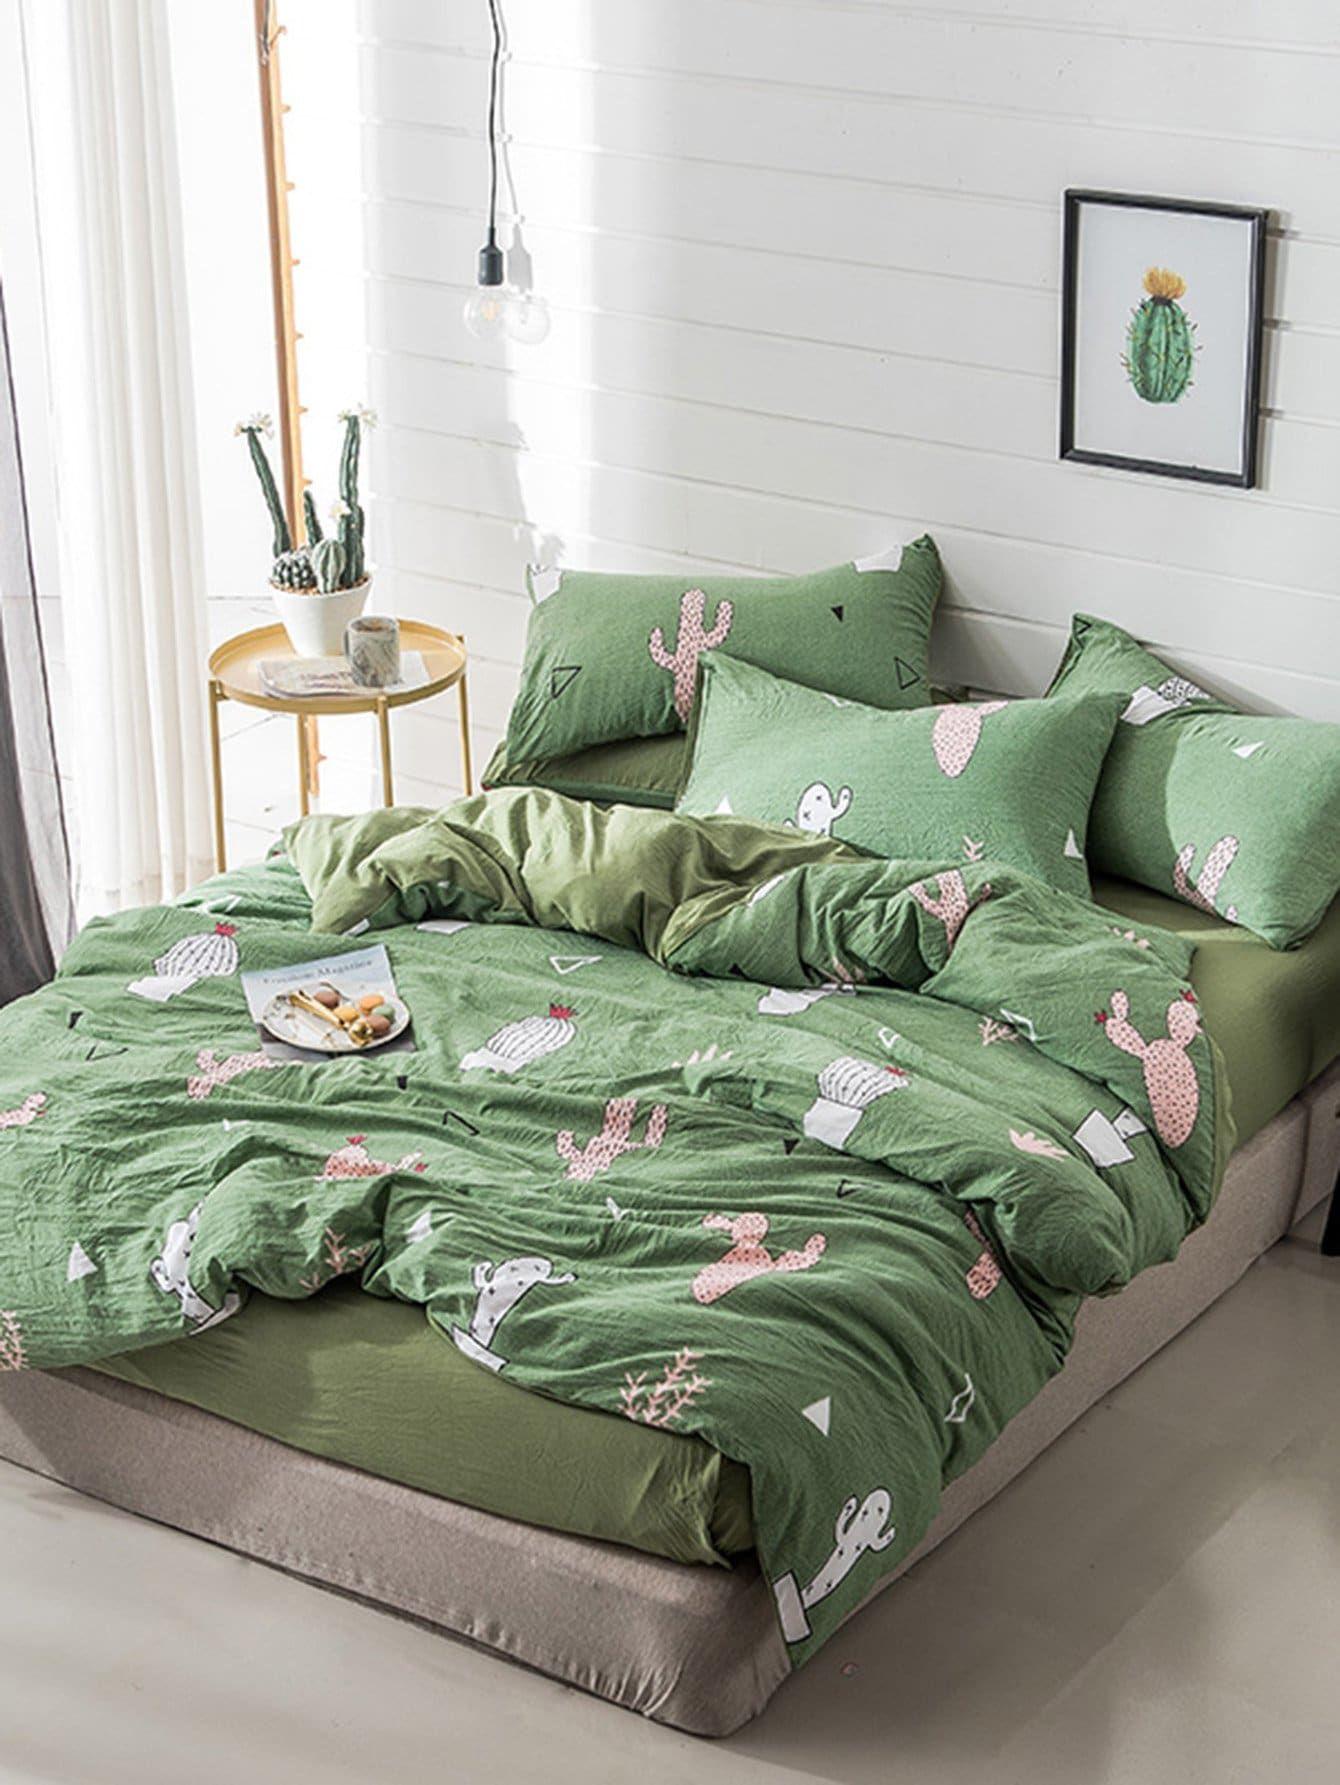 Cactus & Geometric Print Sheet Set SHEIN Green bed